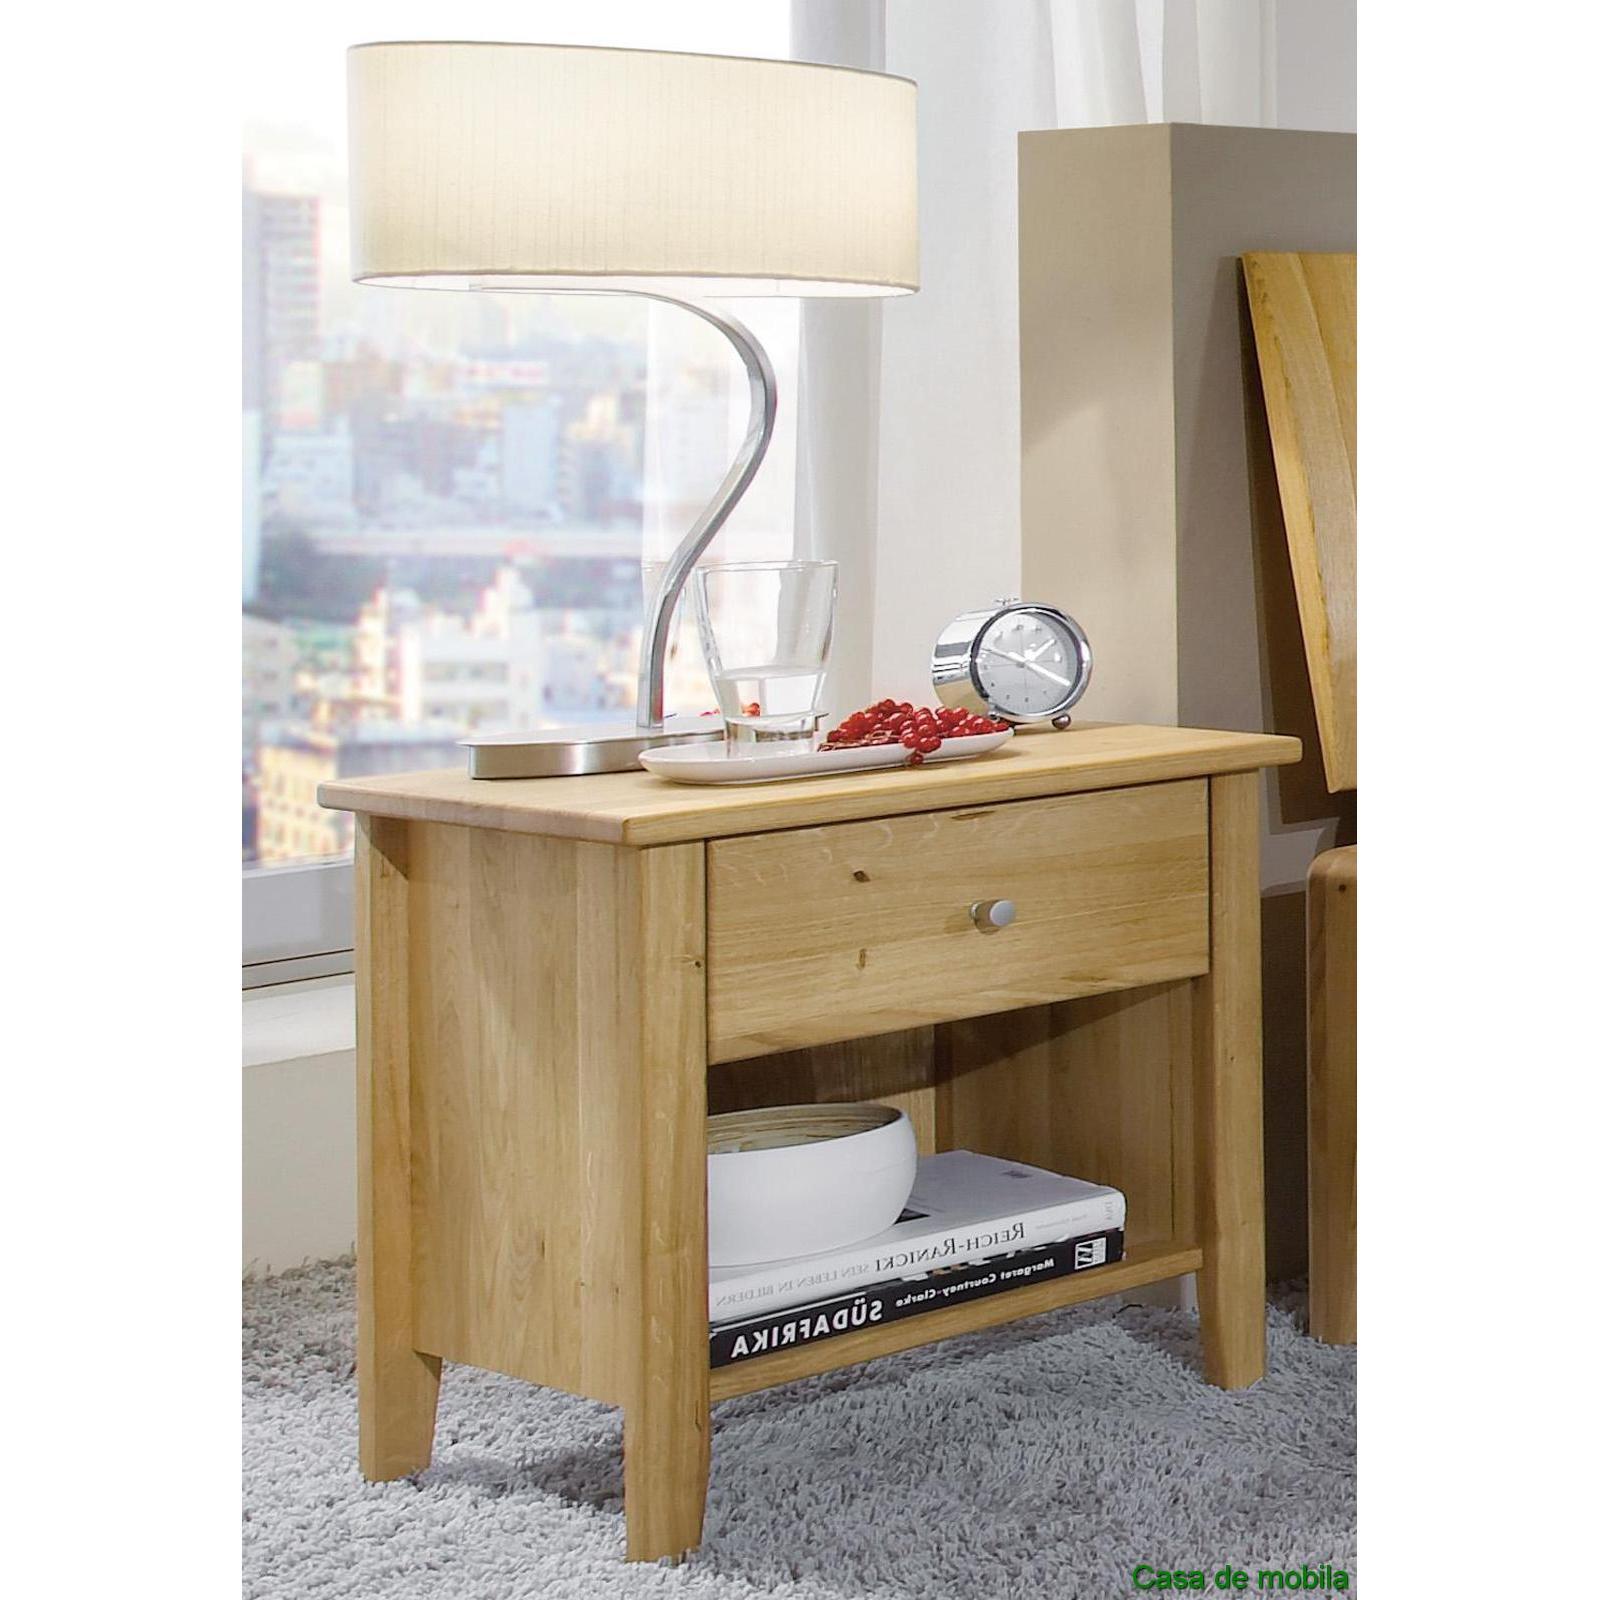 vollholz nachttisch nachtschrank nachtkonsole massiv holz. Black Bedroom Furniture Sets. Home Design Ideas